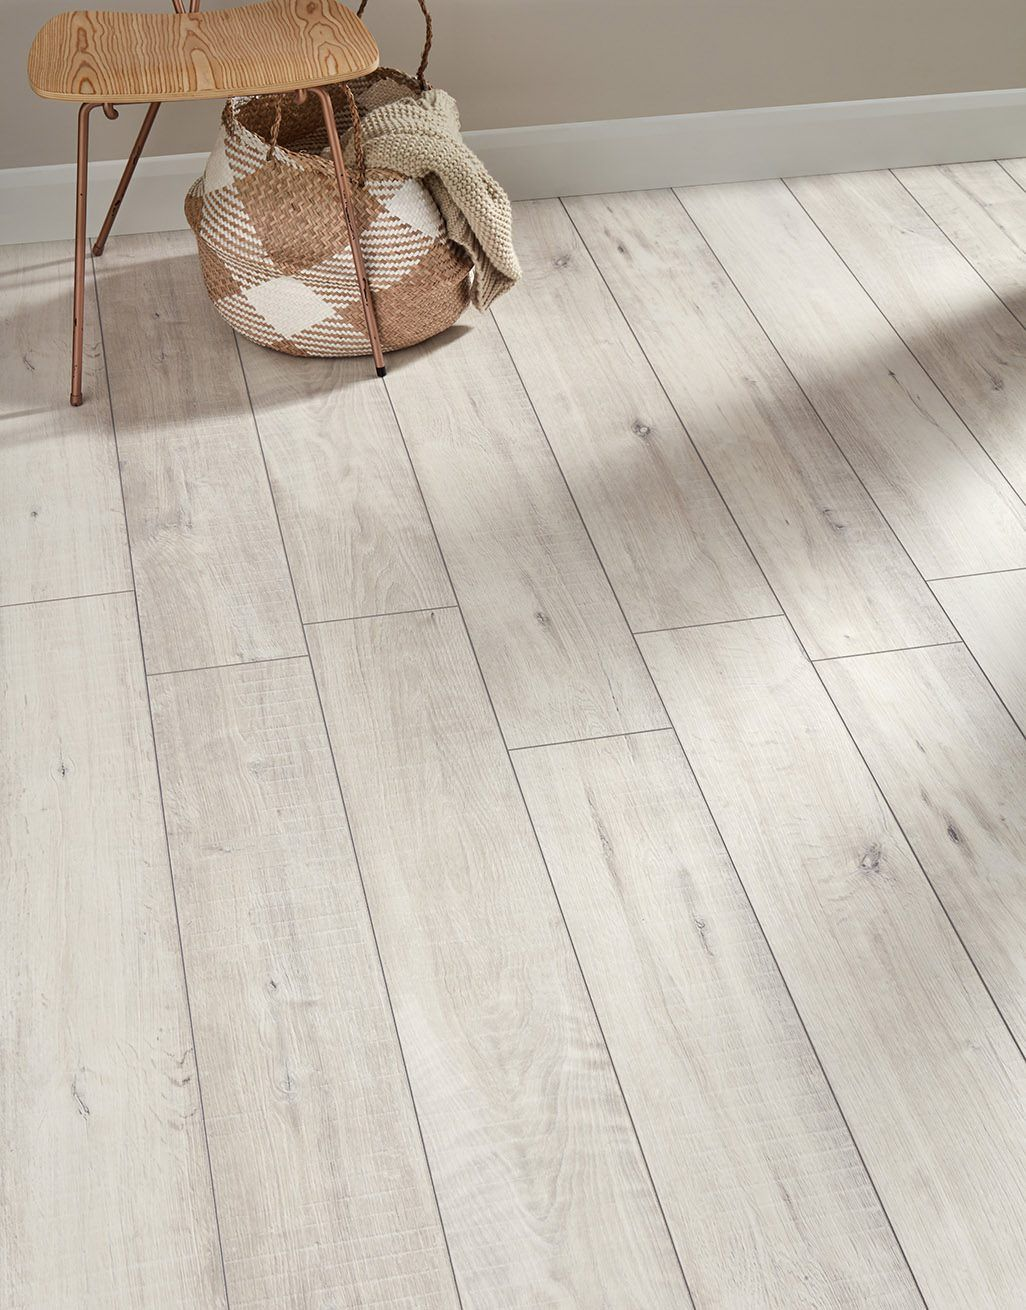 Gala Oak White Laminate Flooring, White Oak Laminate Flooring 12mm